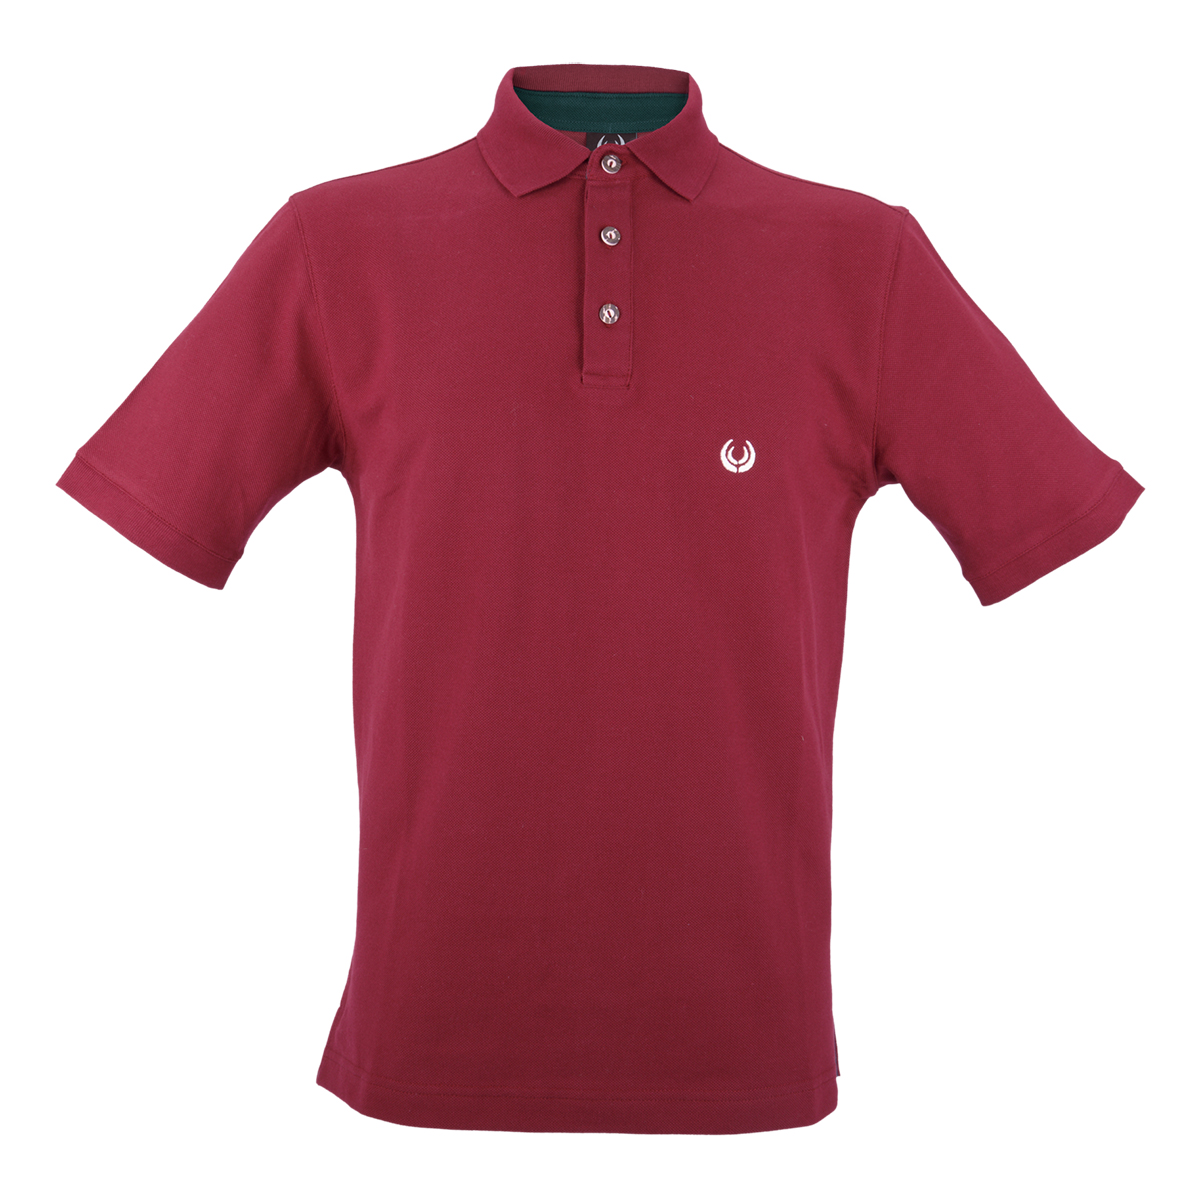 KEYLER Poloshirt Herren Dunkelrot im Keylershop